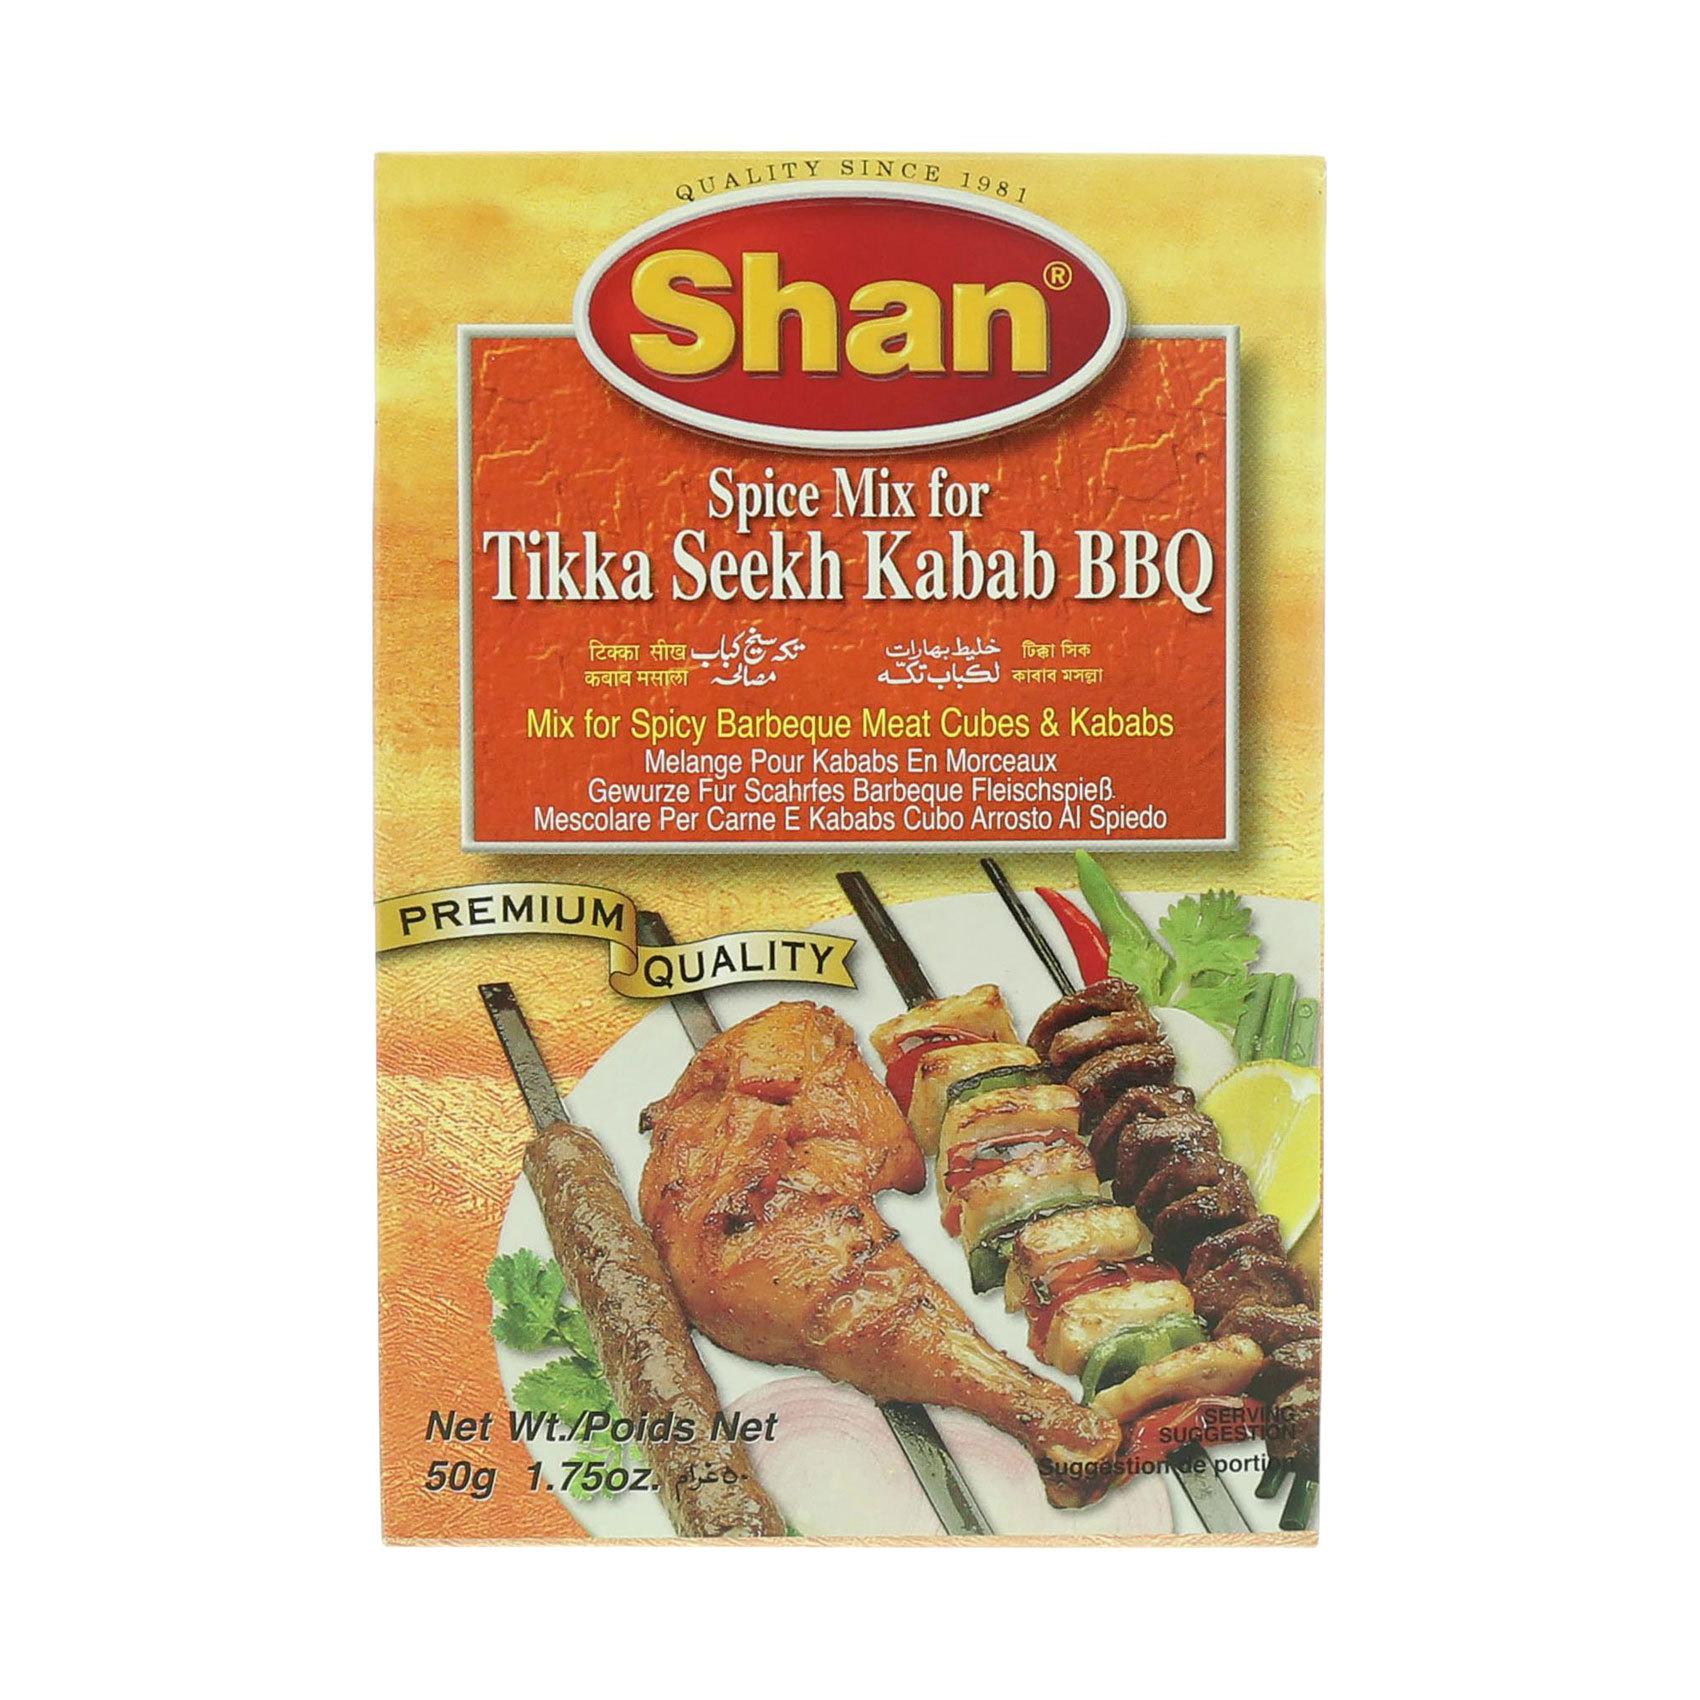 SHAN TIKKA SEEKH KABAB BBQ 50G